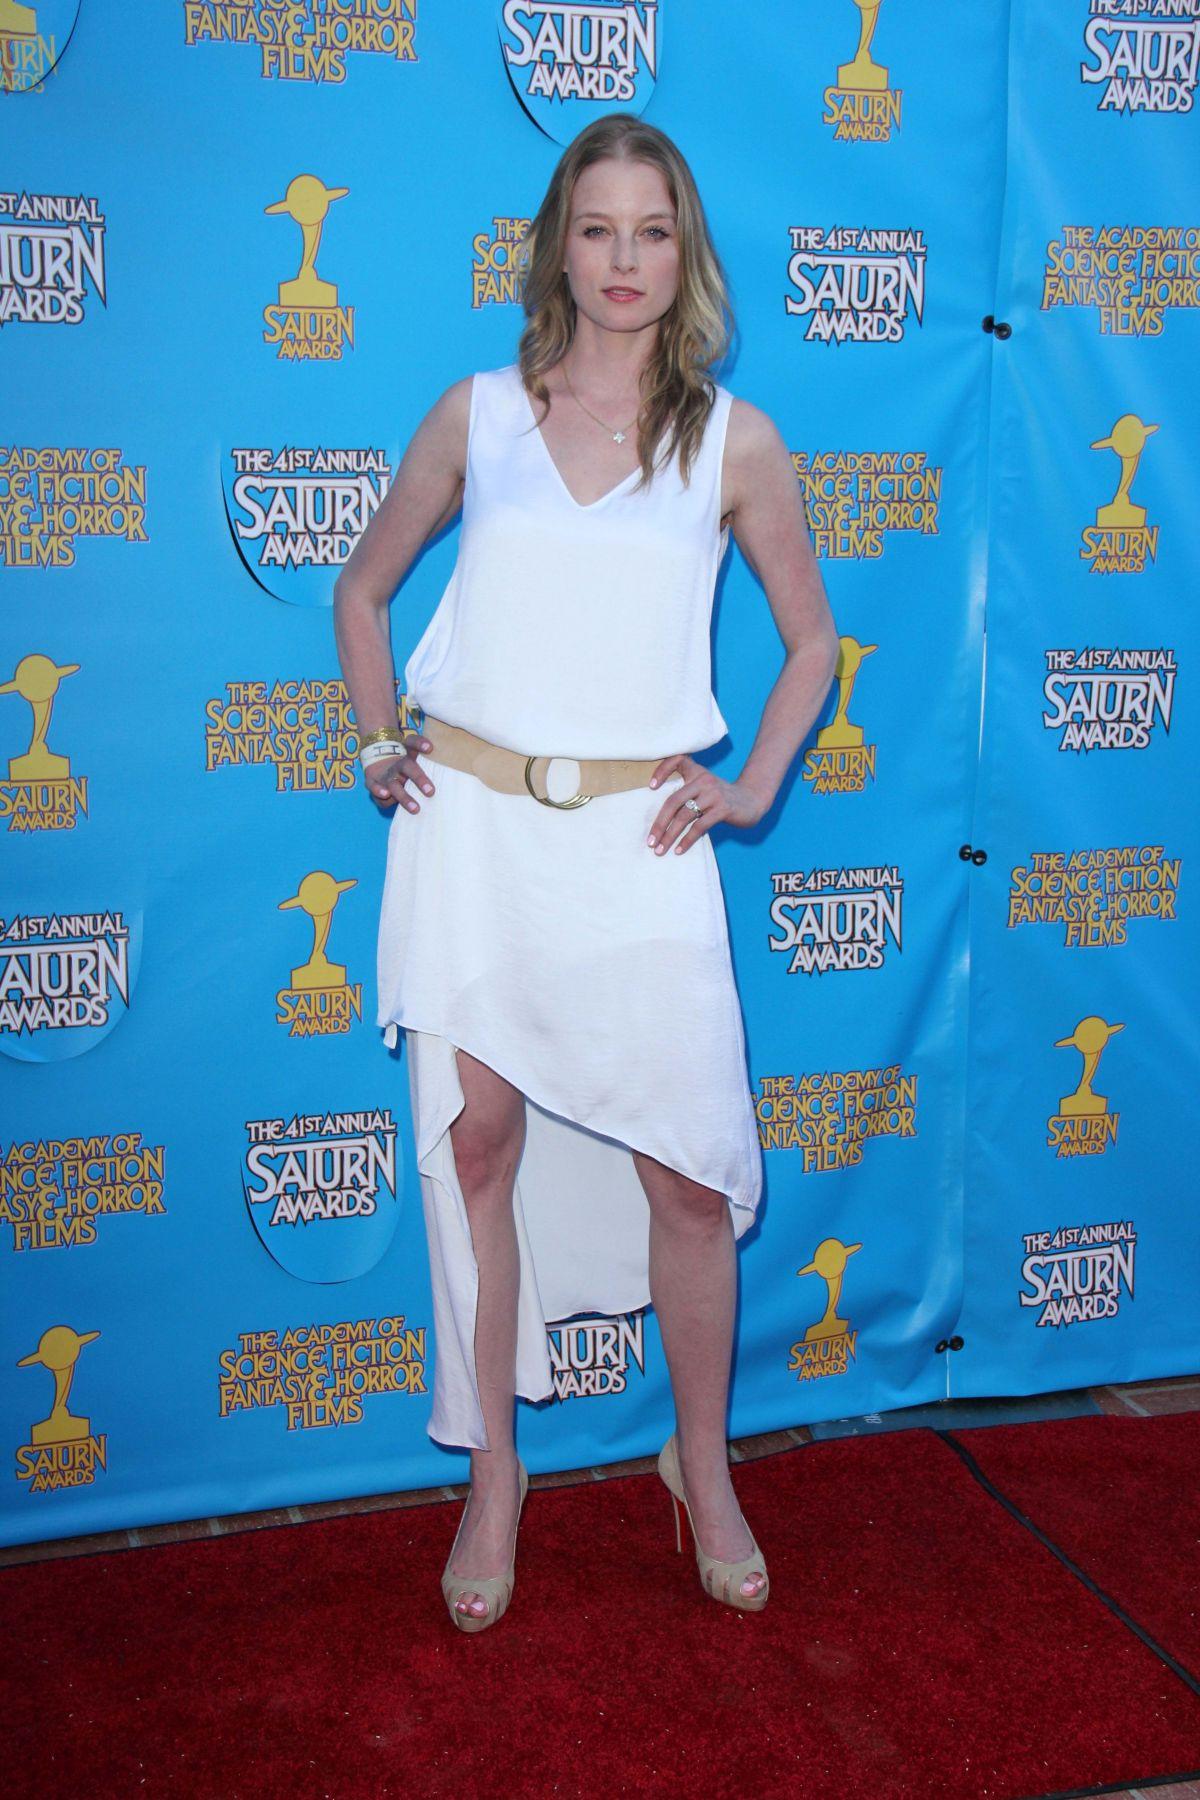 RACHEL NICHOLS at 2015 Saturn Awards in Burbank